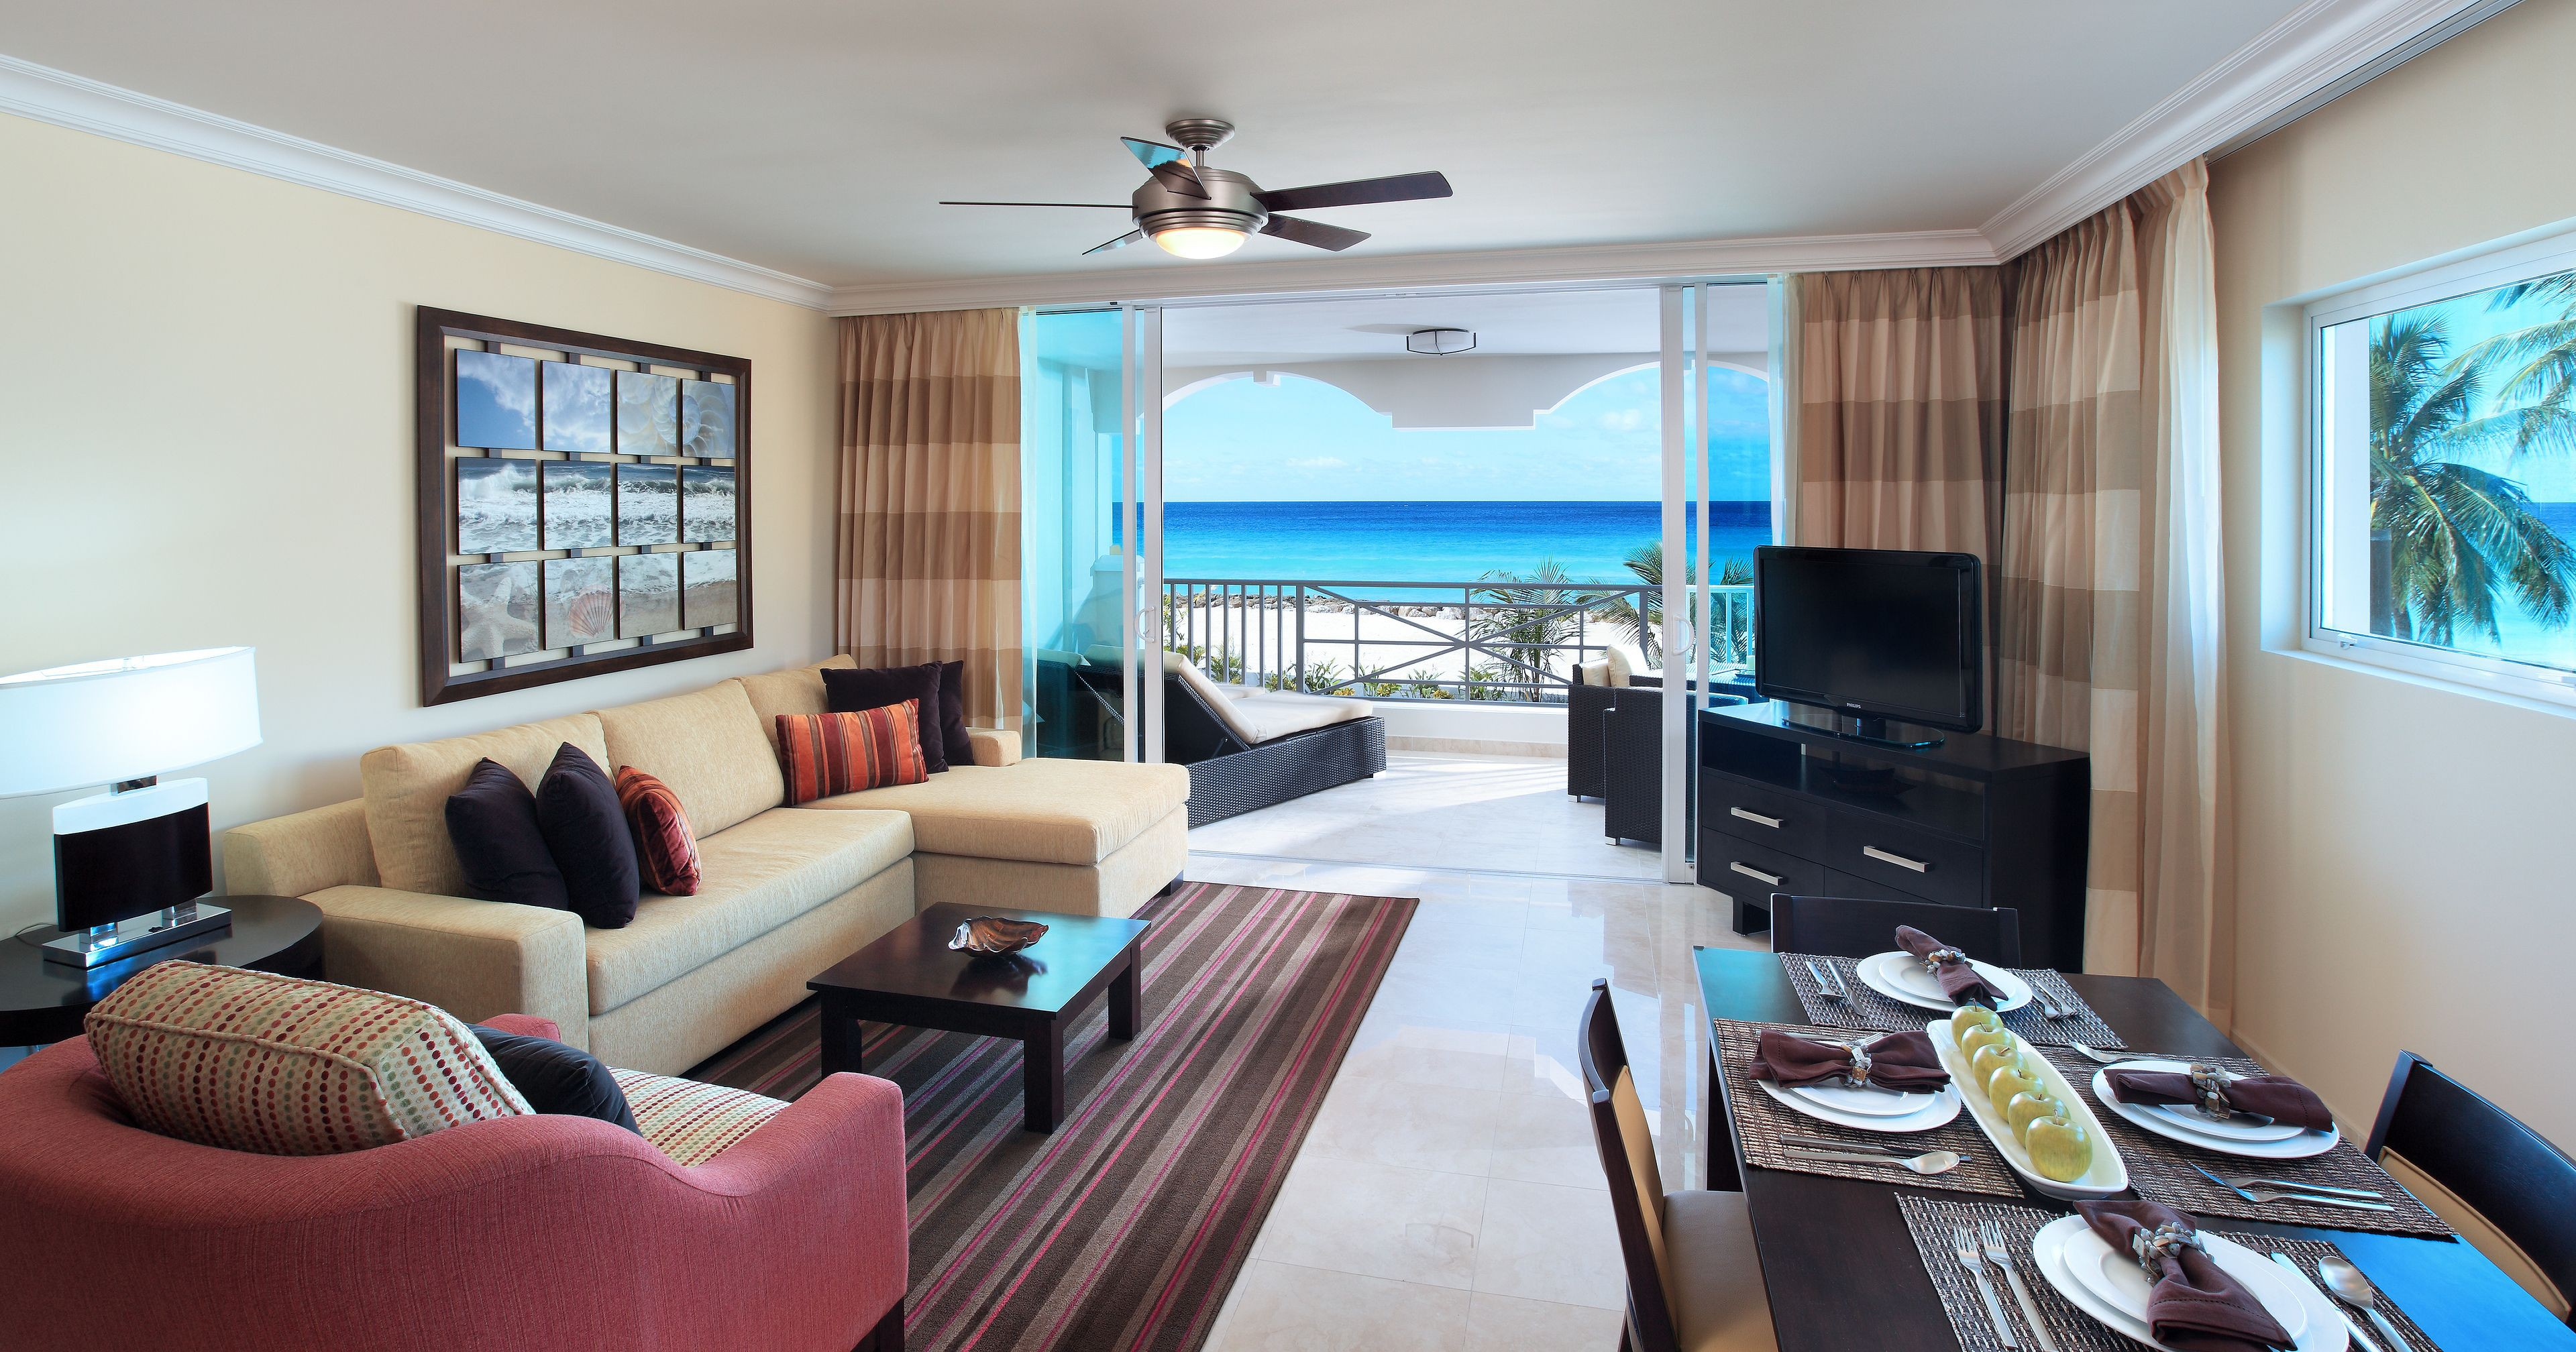 Courtesy of Ocean Two Resort / Expedia